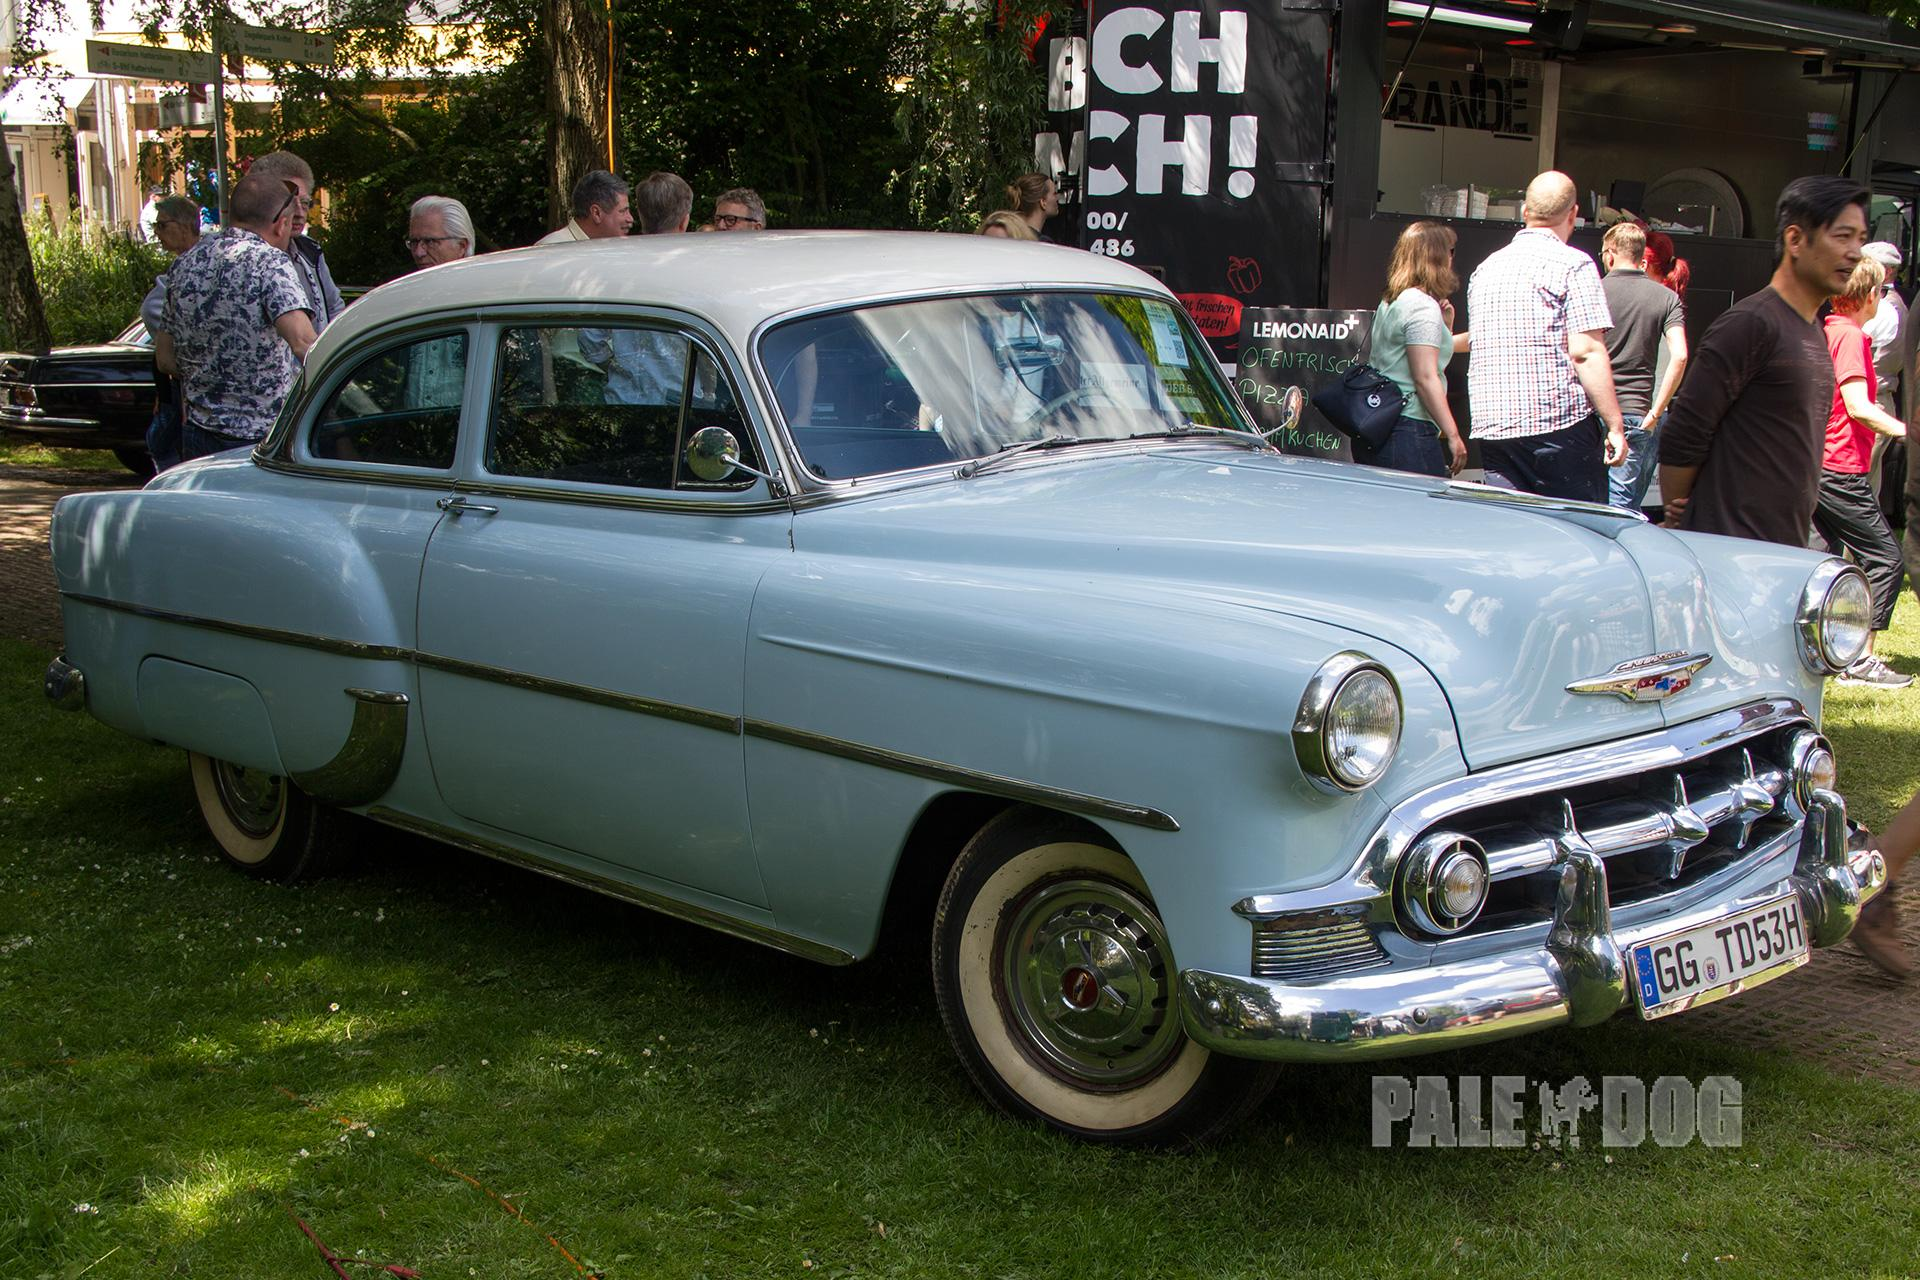 1953 chevrolet bel air sedan front view post war for 1953 chevrolet belair 4 door sedan